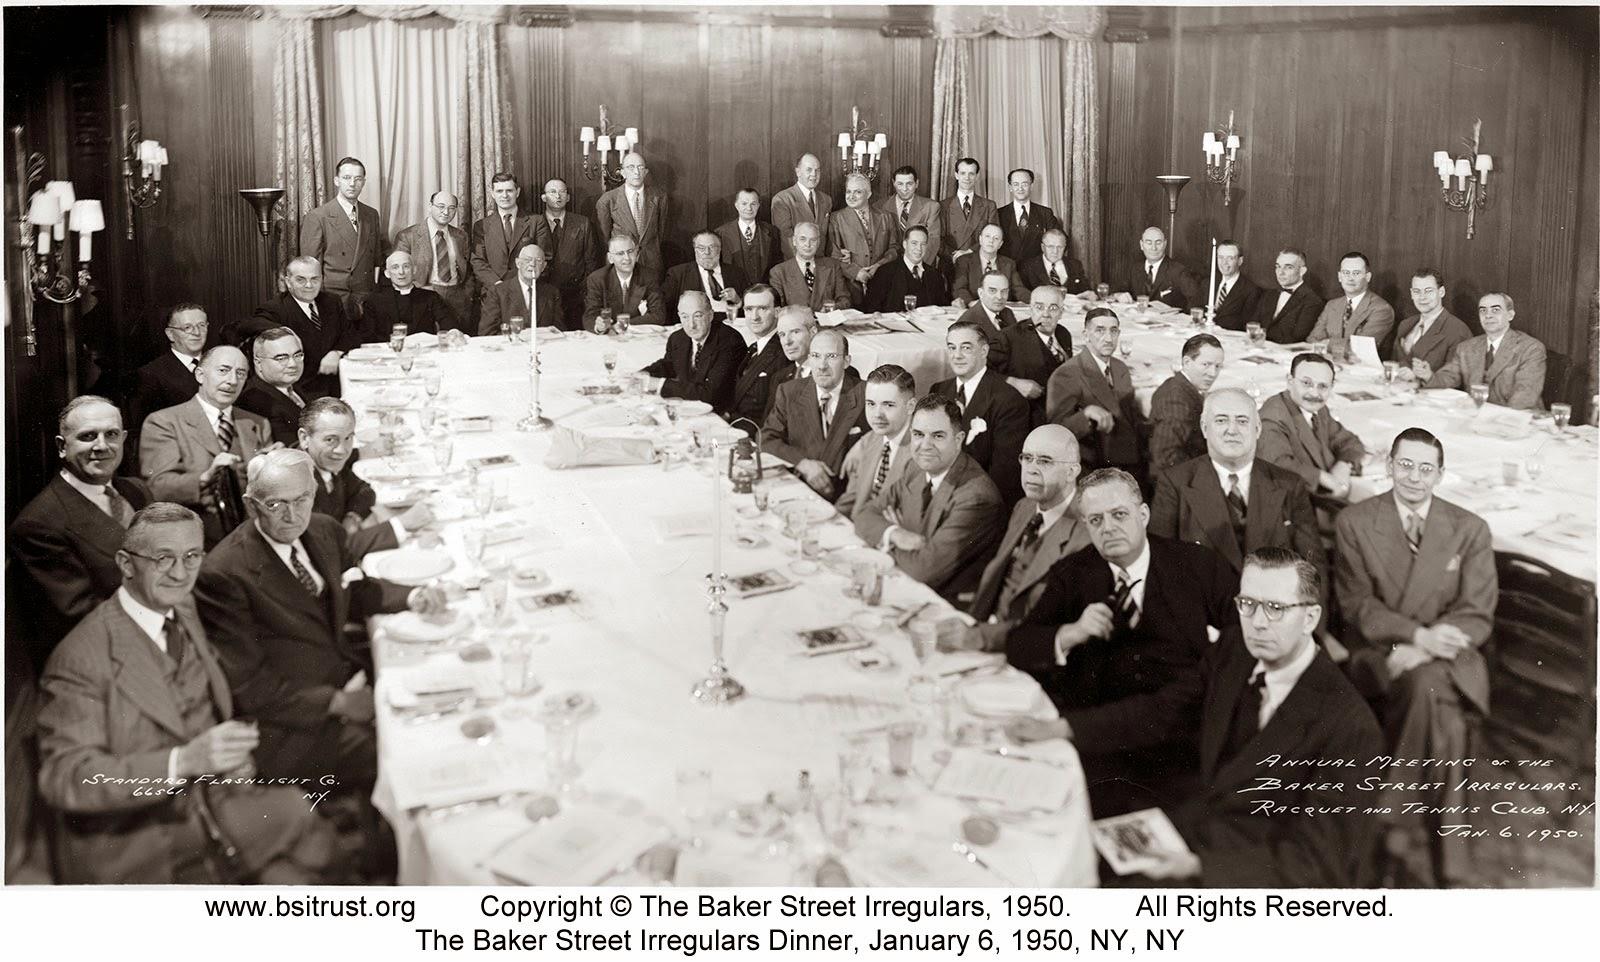 The 1950 BSI Dinner group photo